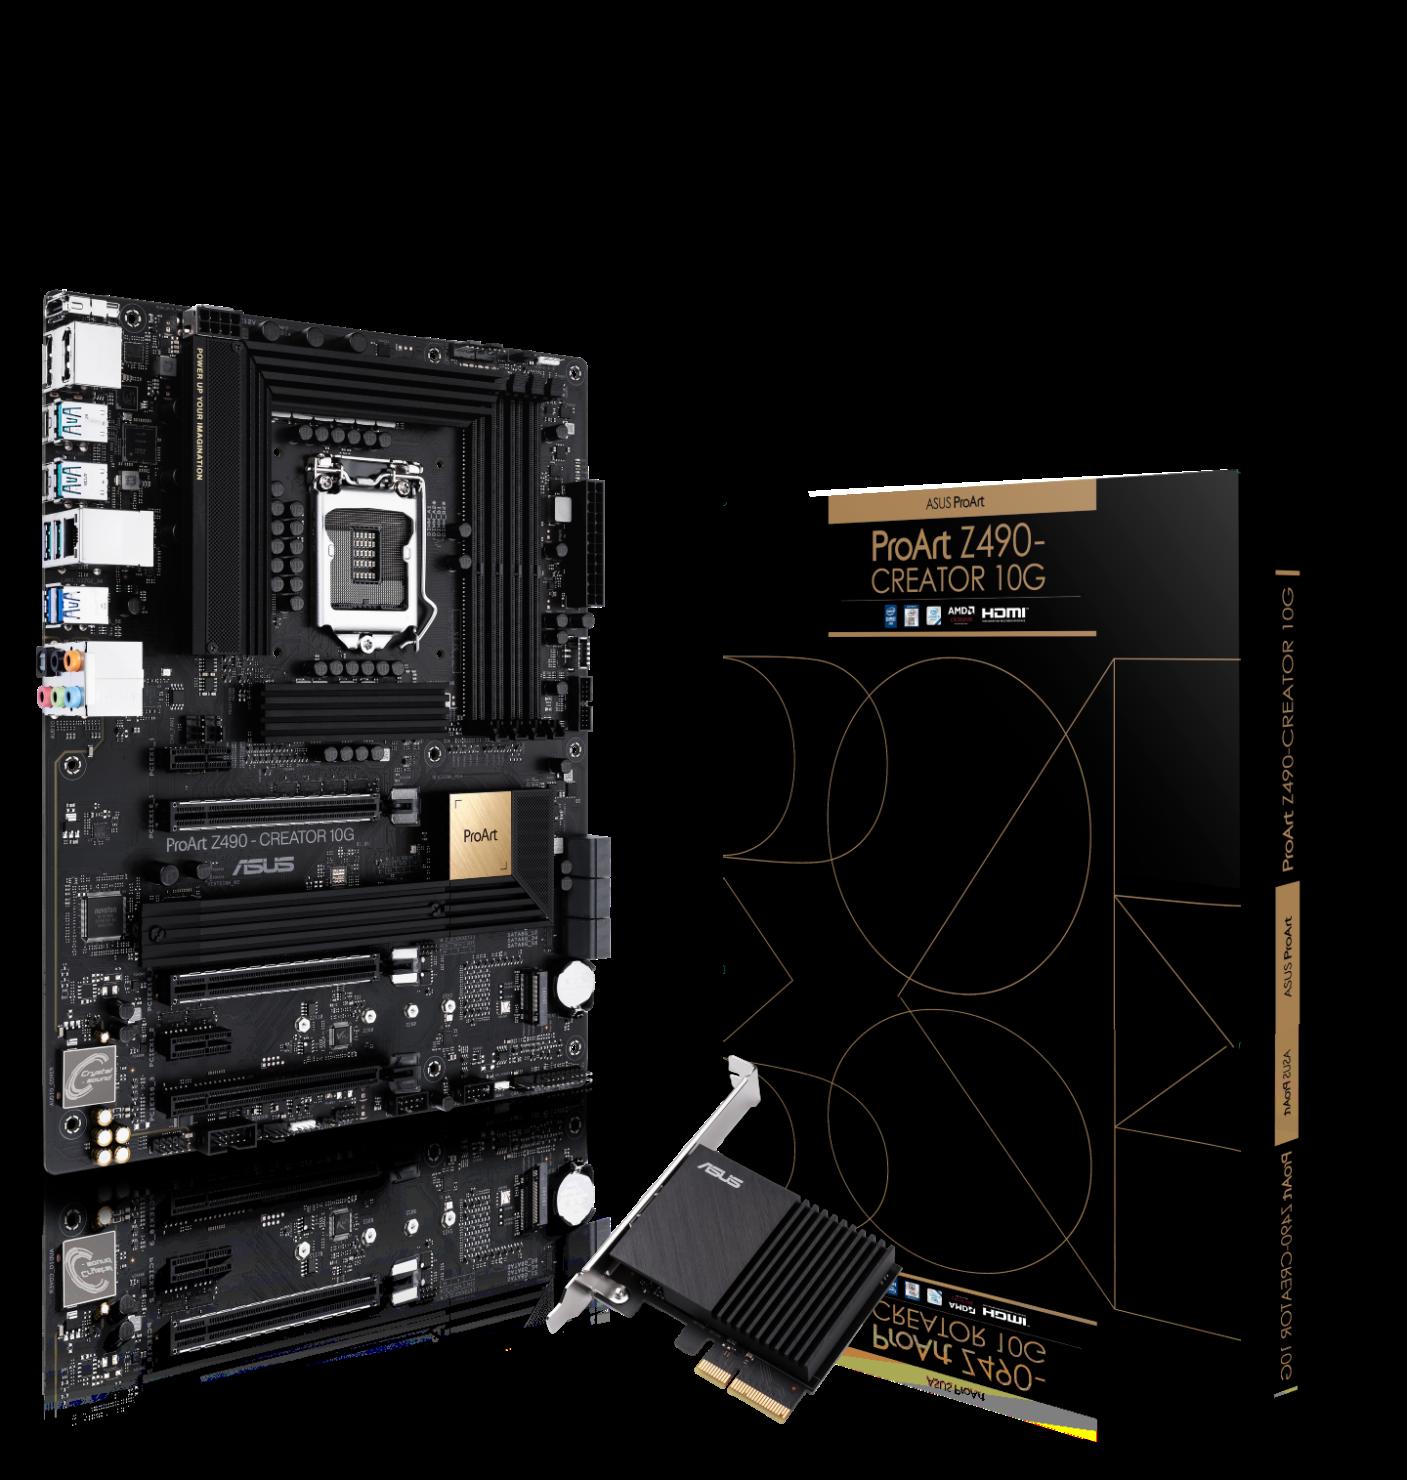 proart-z490-creator-10g-with-box-custom